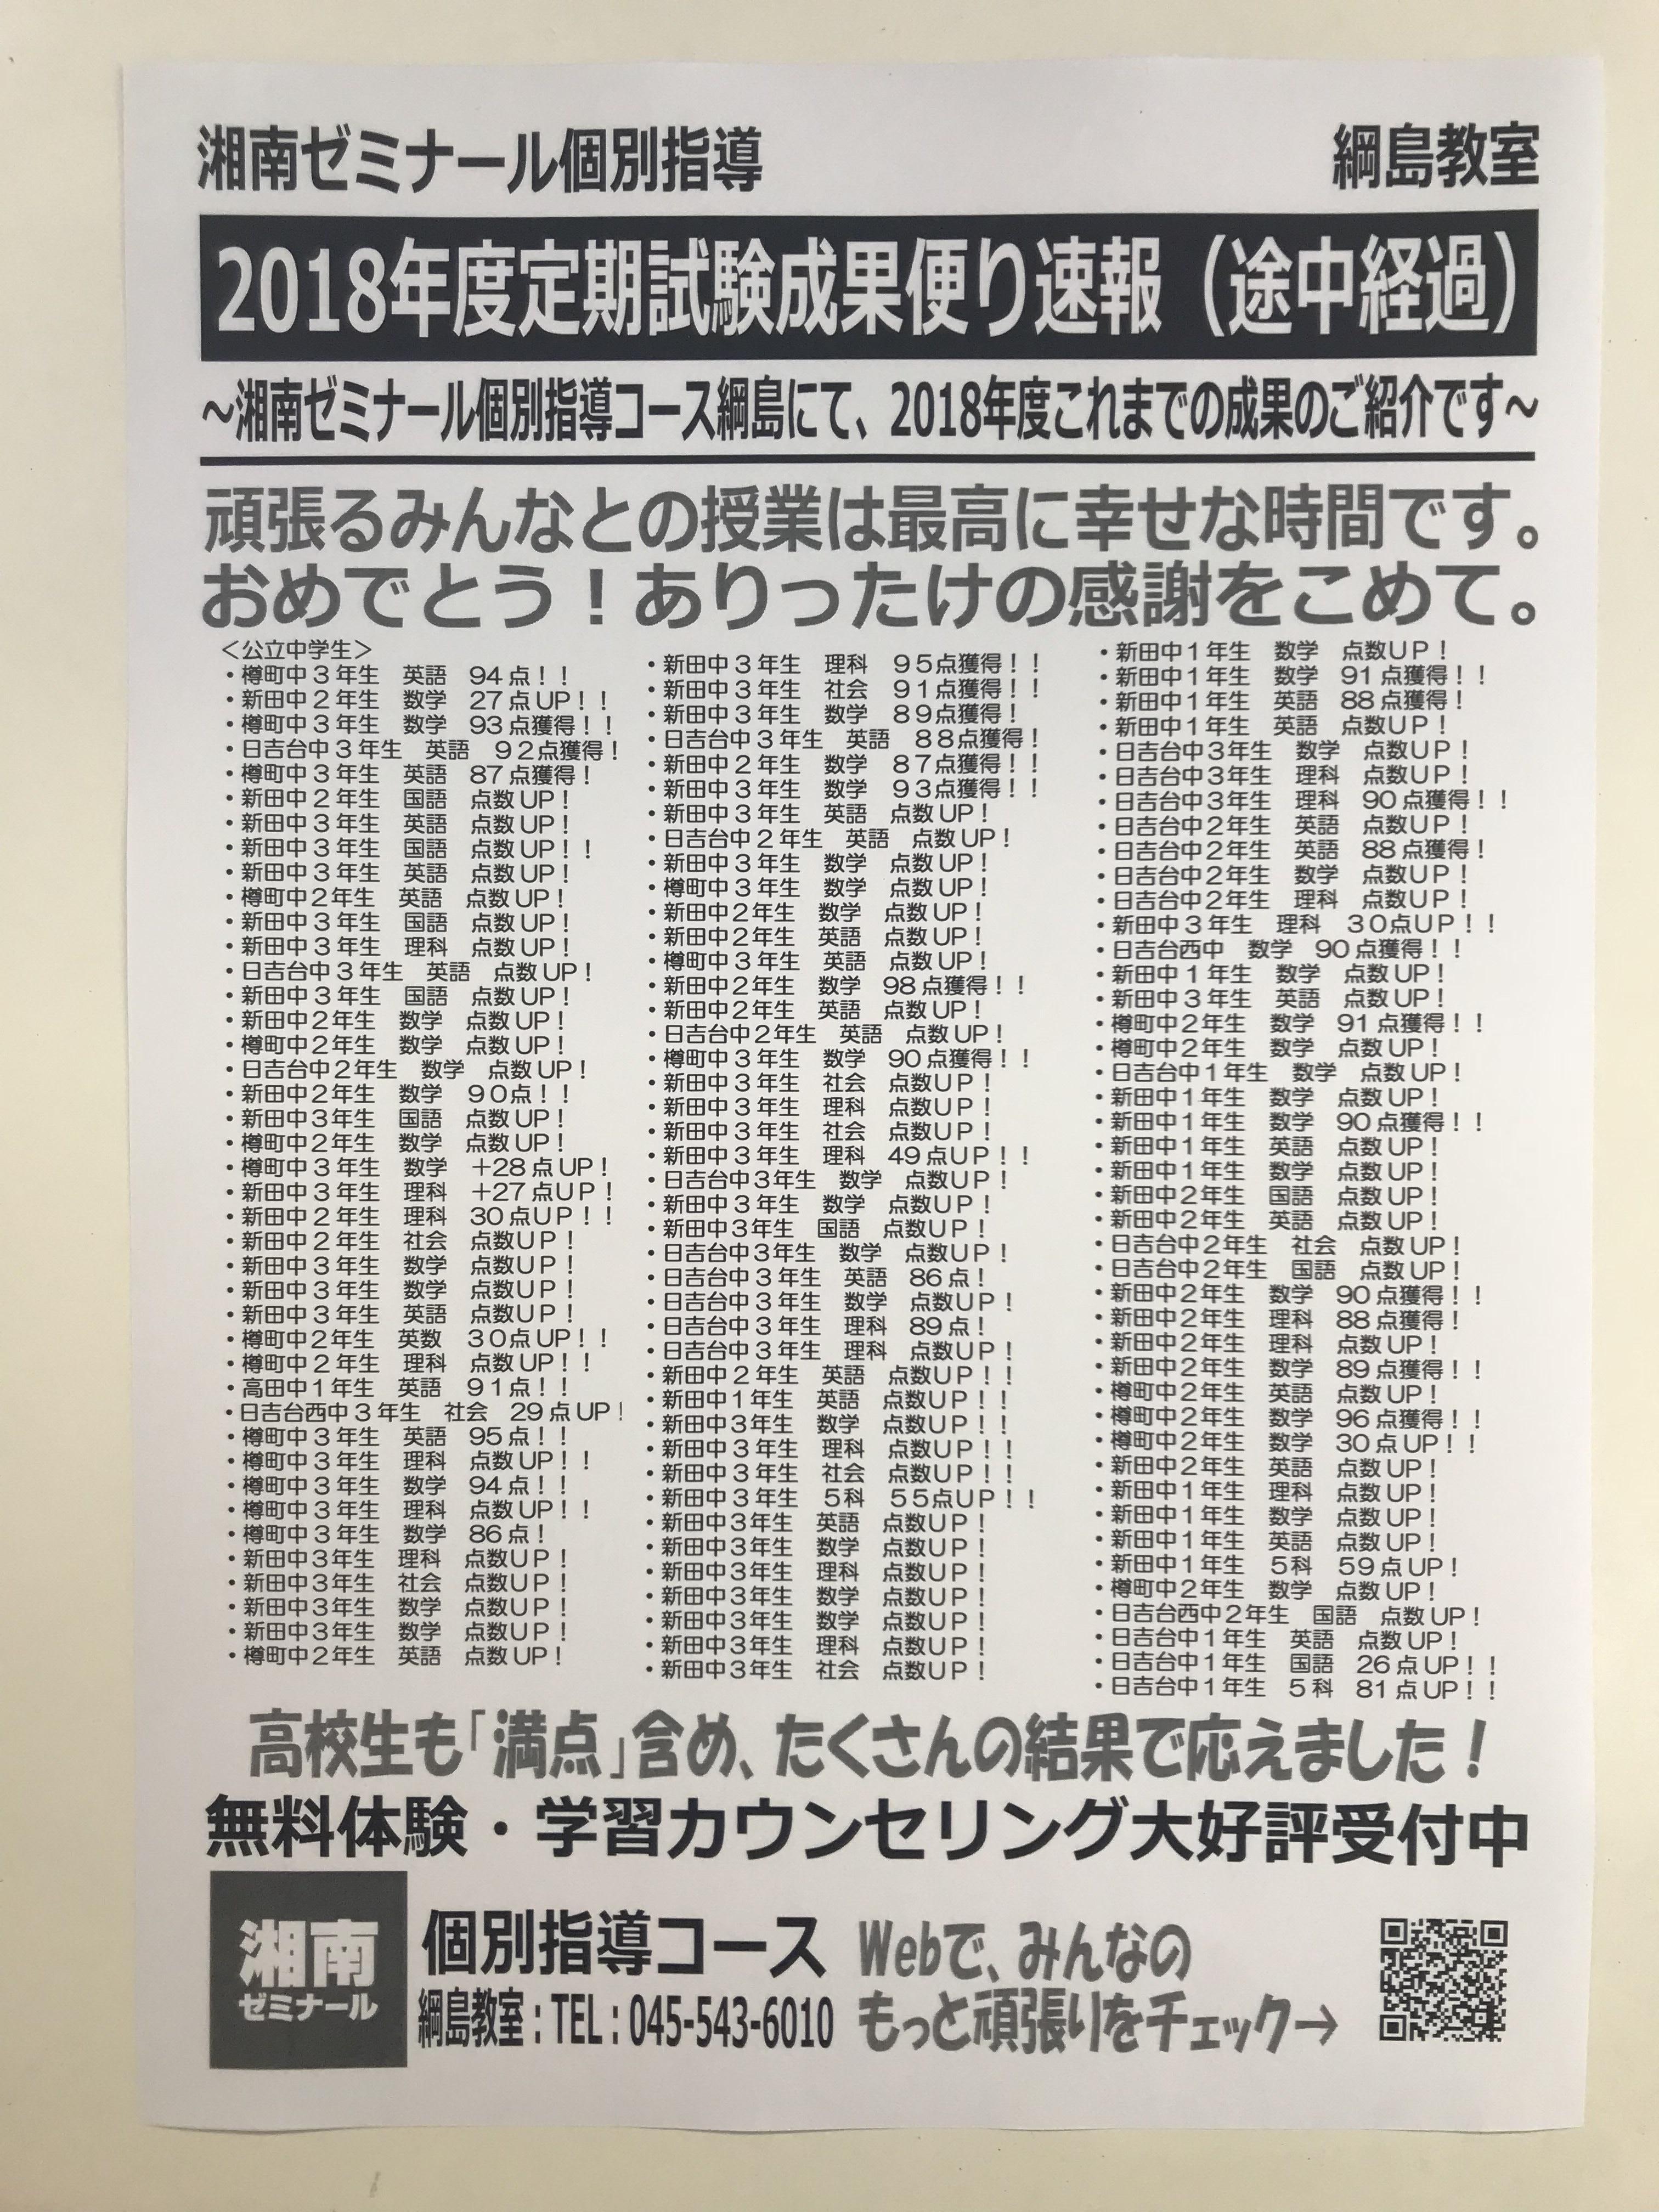 image_67172609.JPG